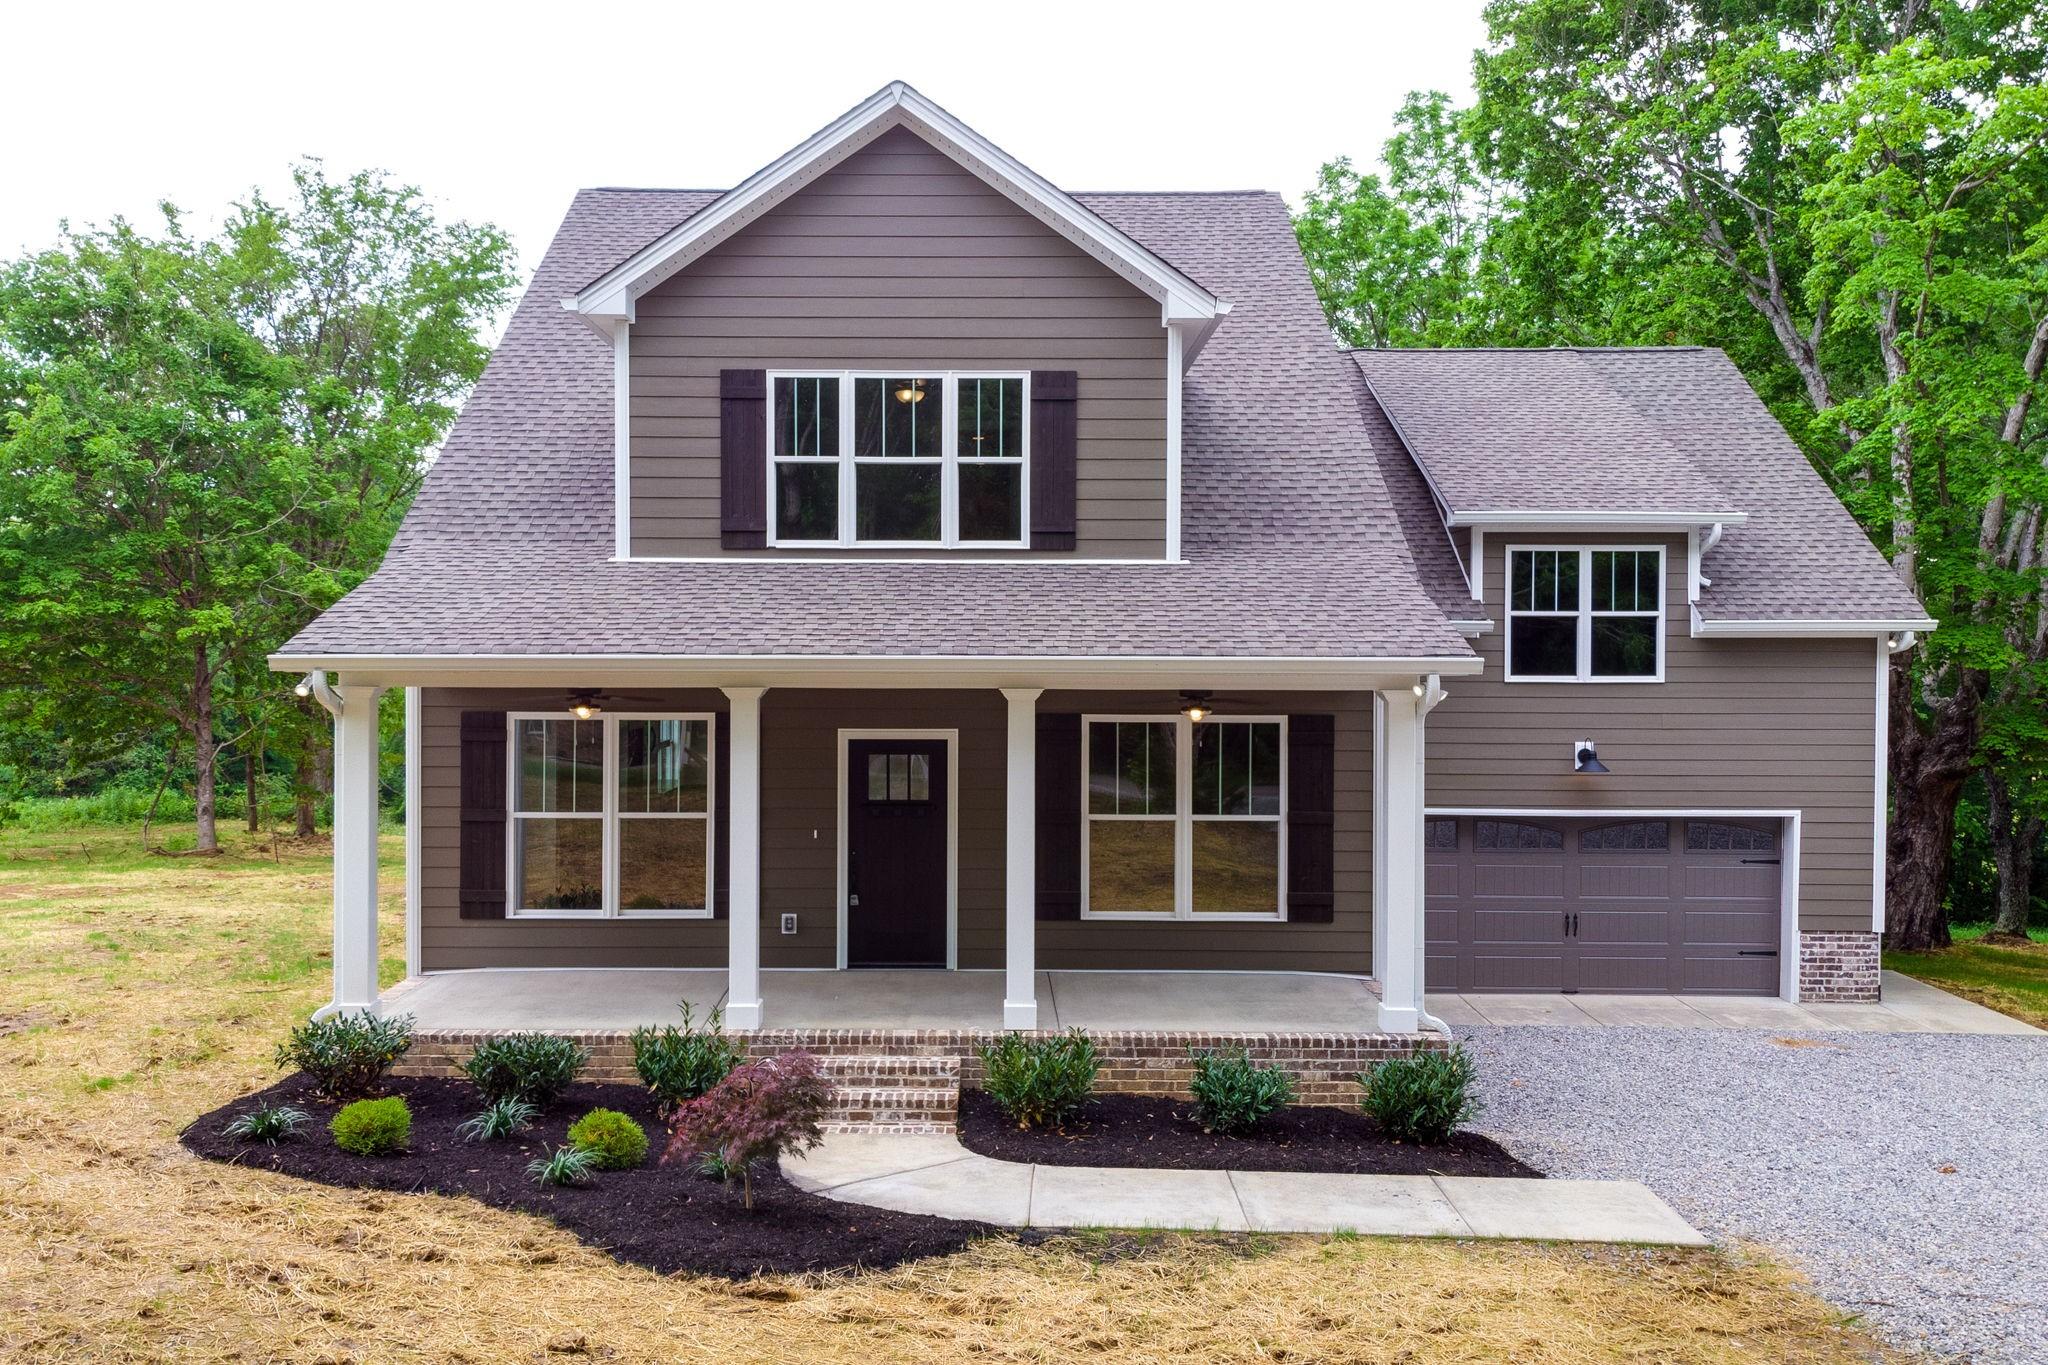 3242 Pinson School Road, Greenbrier, TN 37073 - Greenbrier, TN real estate listing